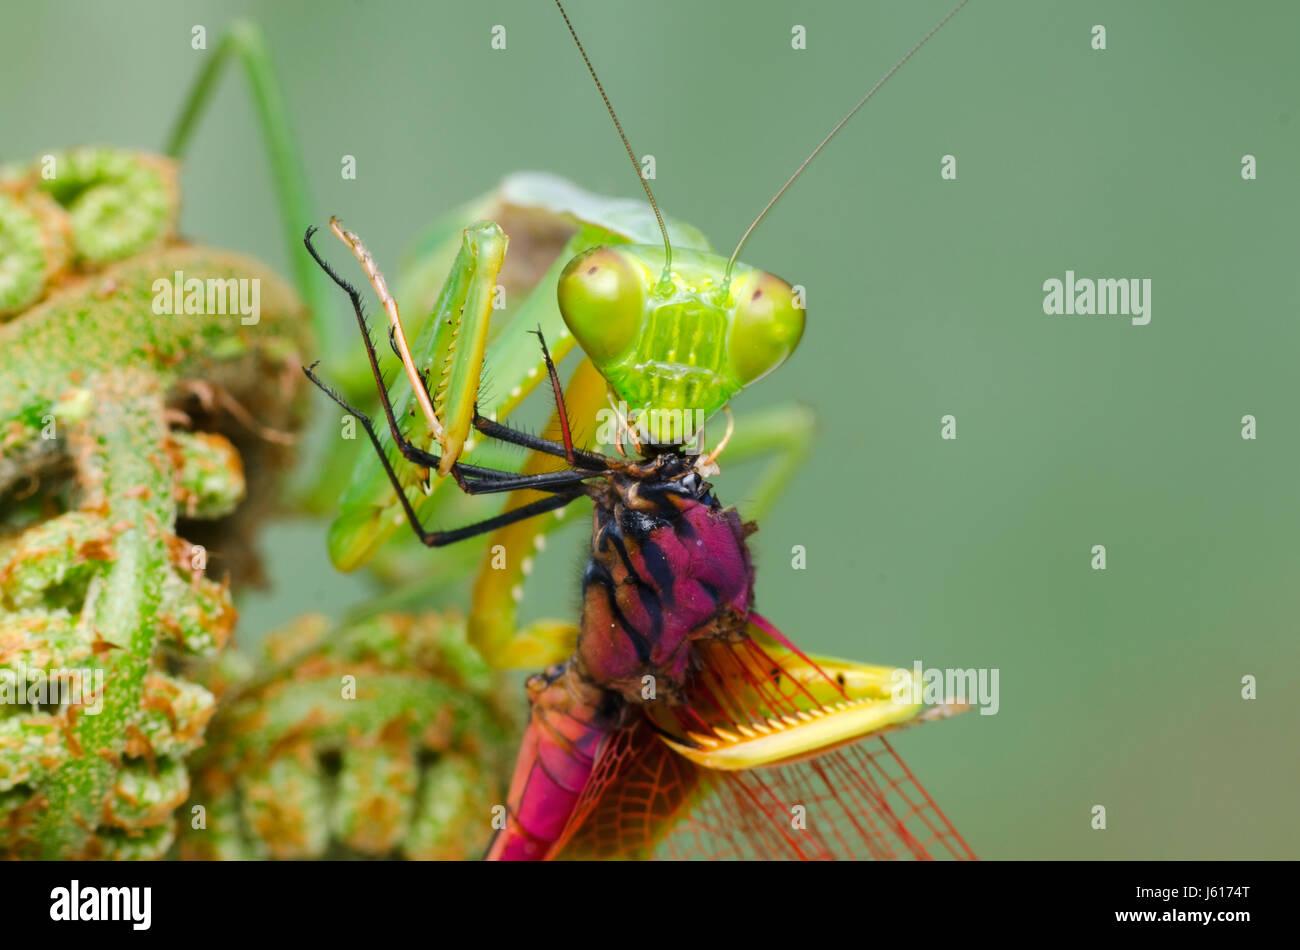 Praying Mantis Fütterung auf Libelle. Hierodula.SP Lebensraum in Malaysia Stockbild